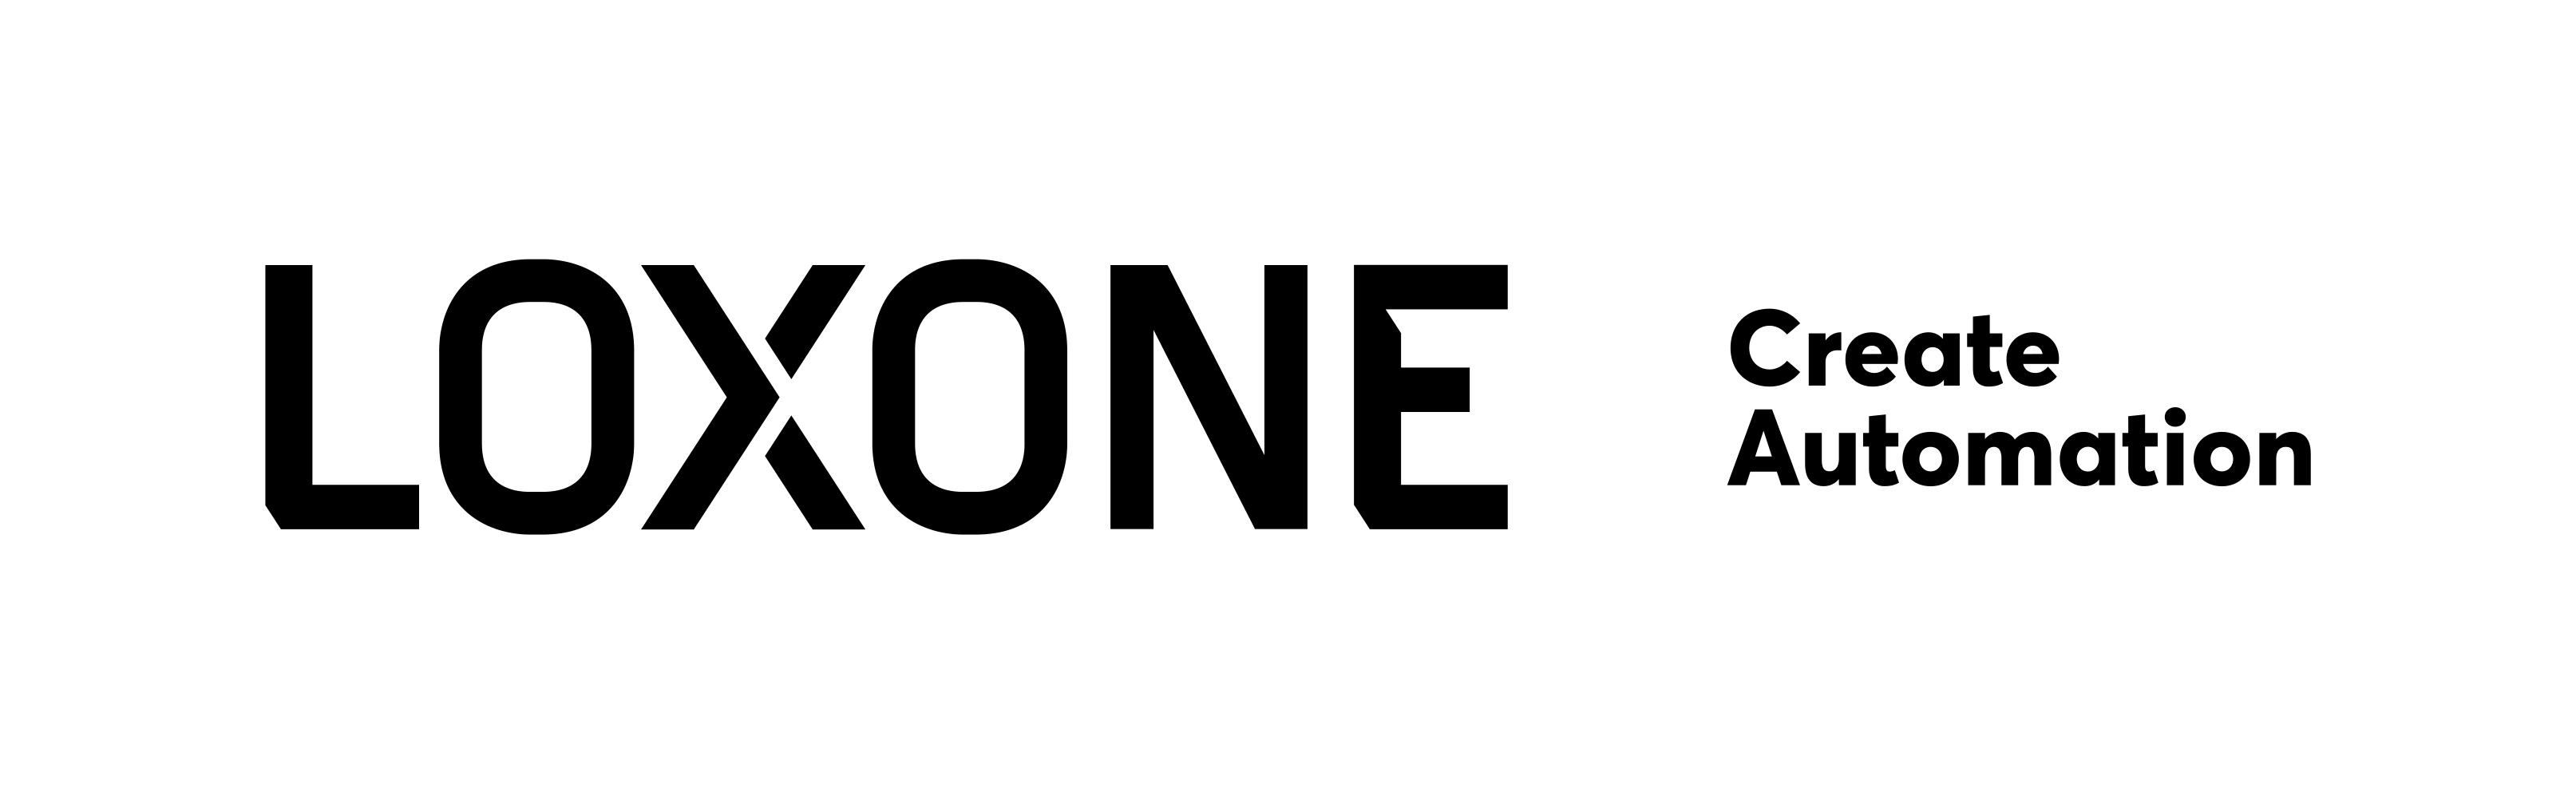 Loxone Press Resources - Loxone Logo